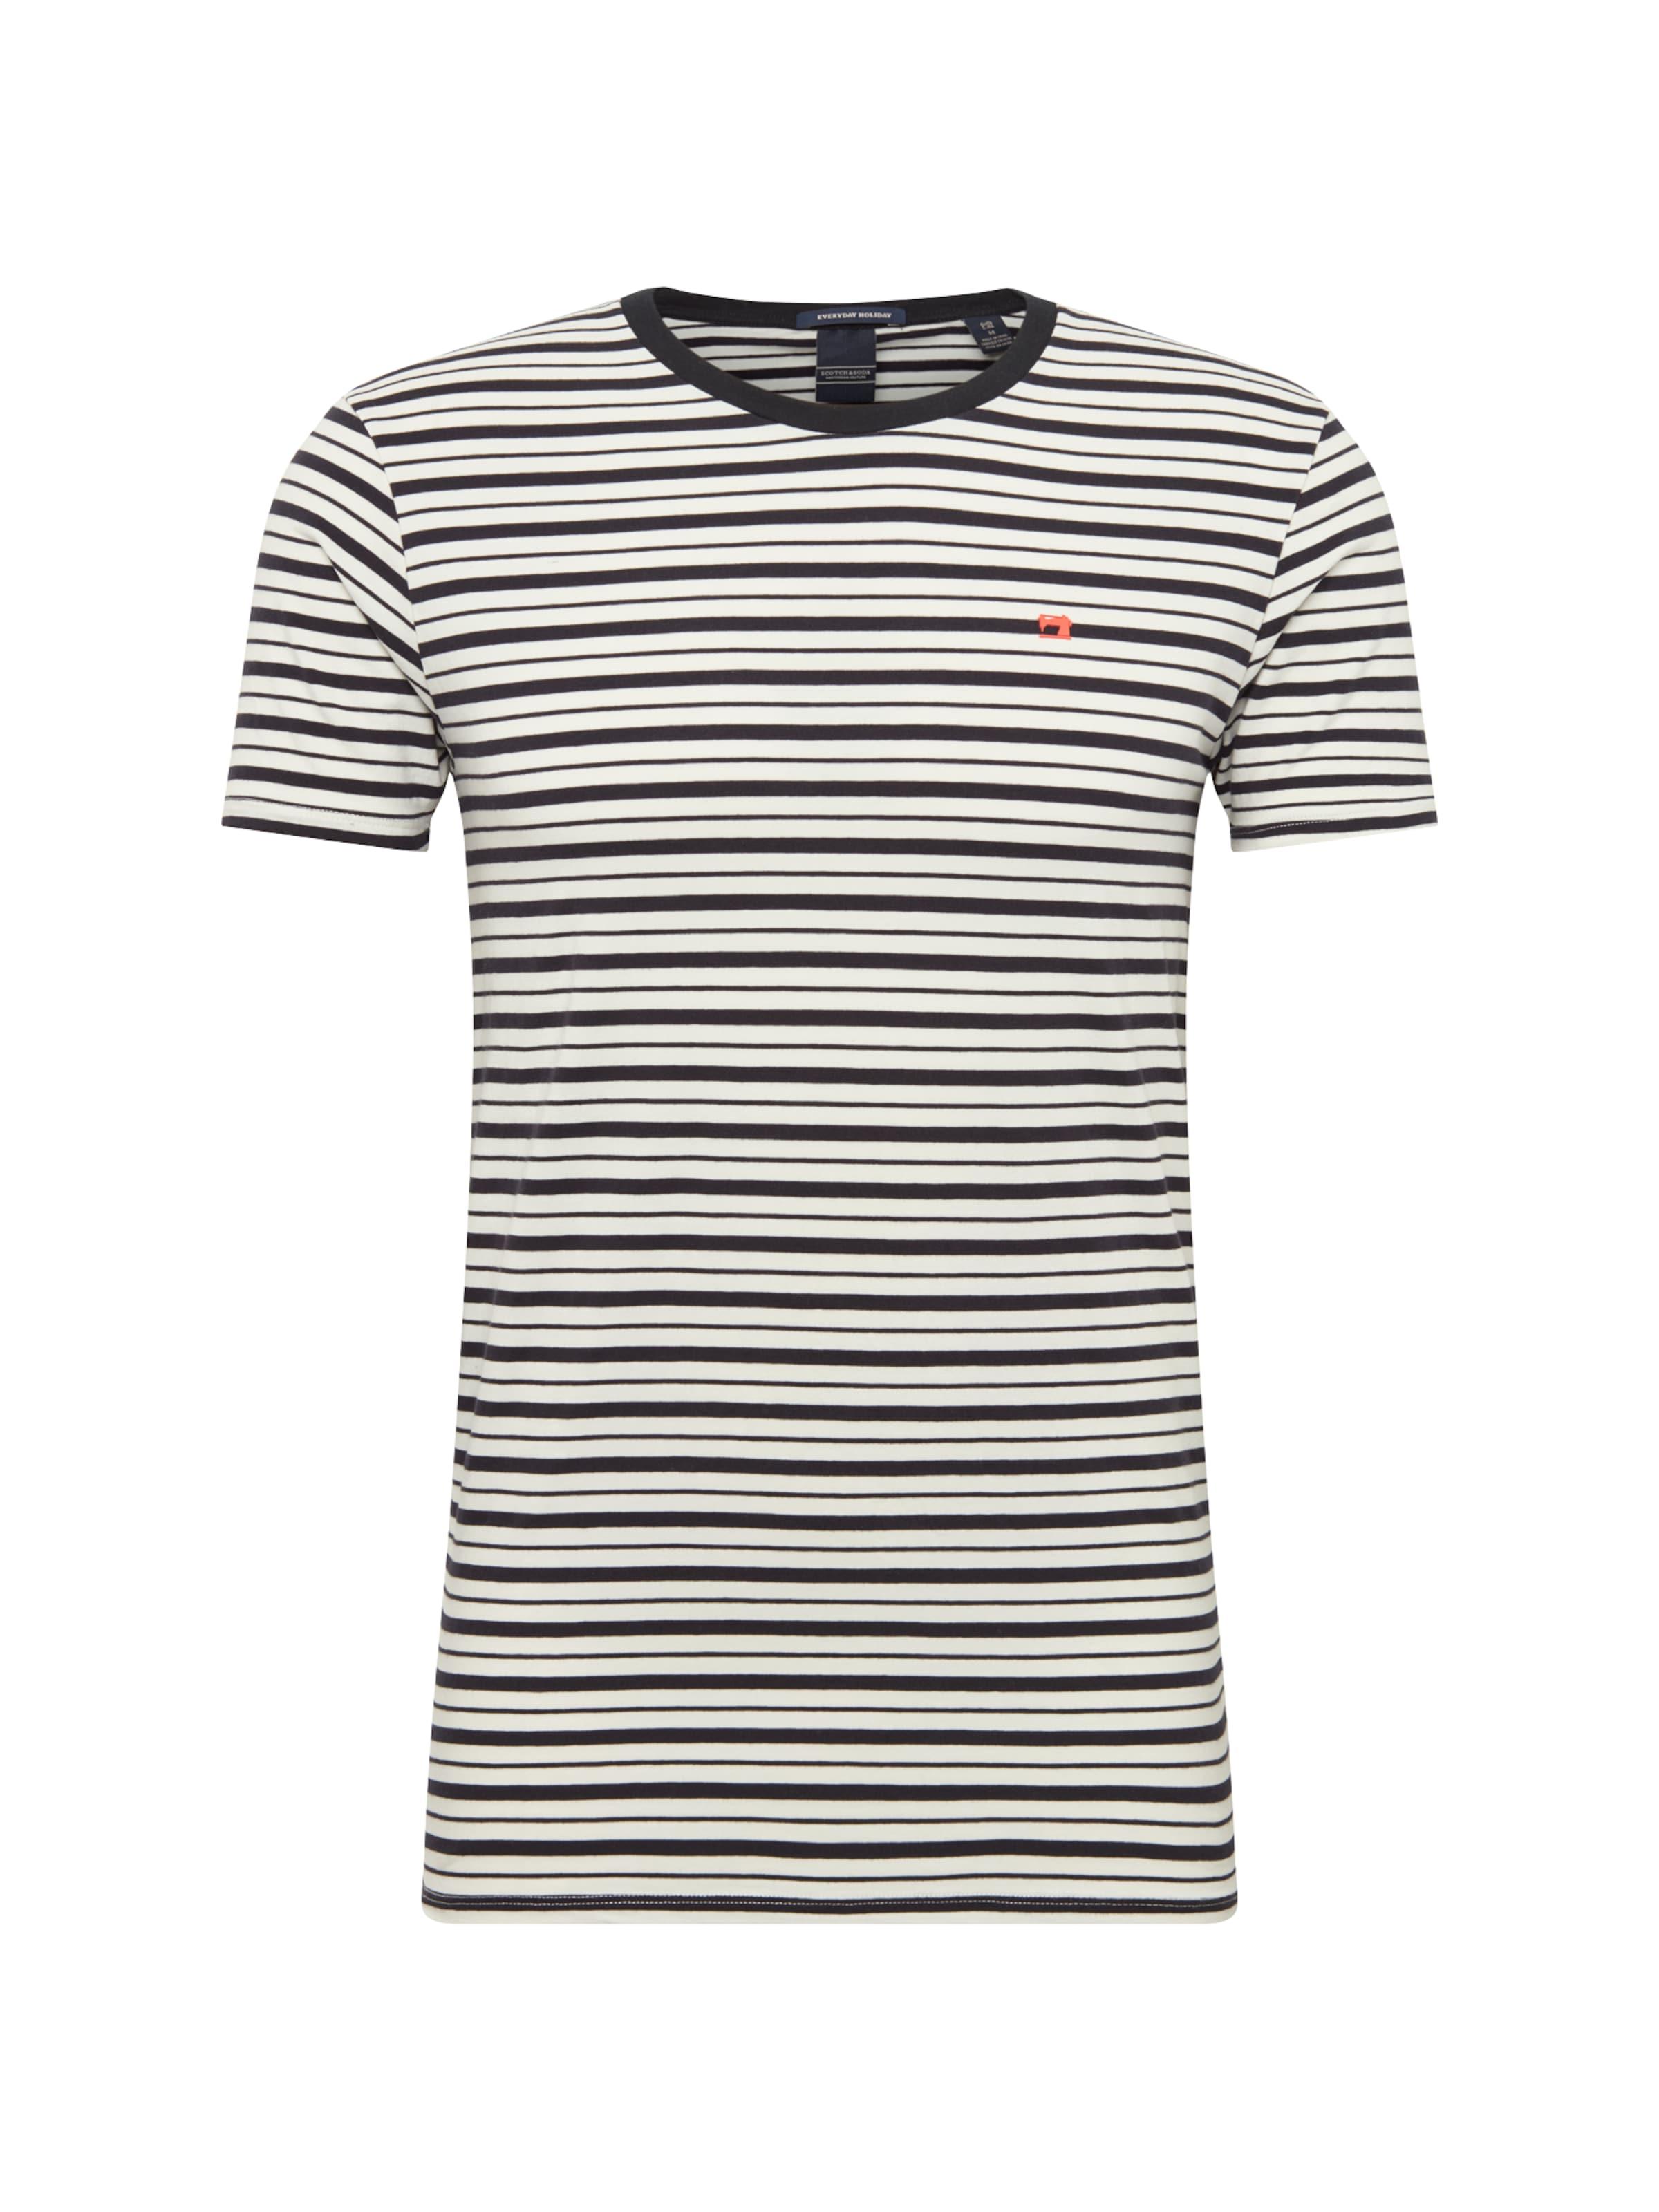 shirt Scotch Blanc T En amp; Noir Soda wxqCt0R